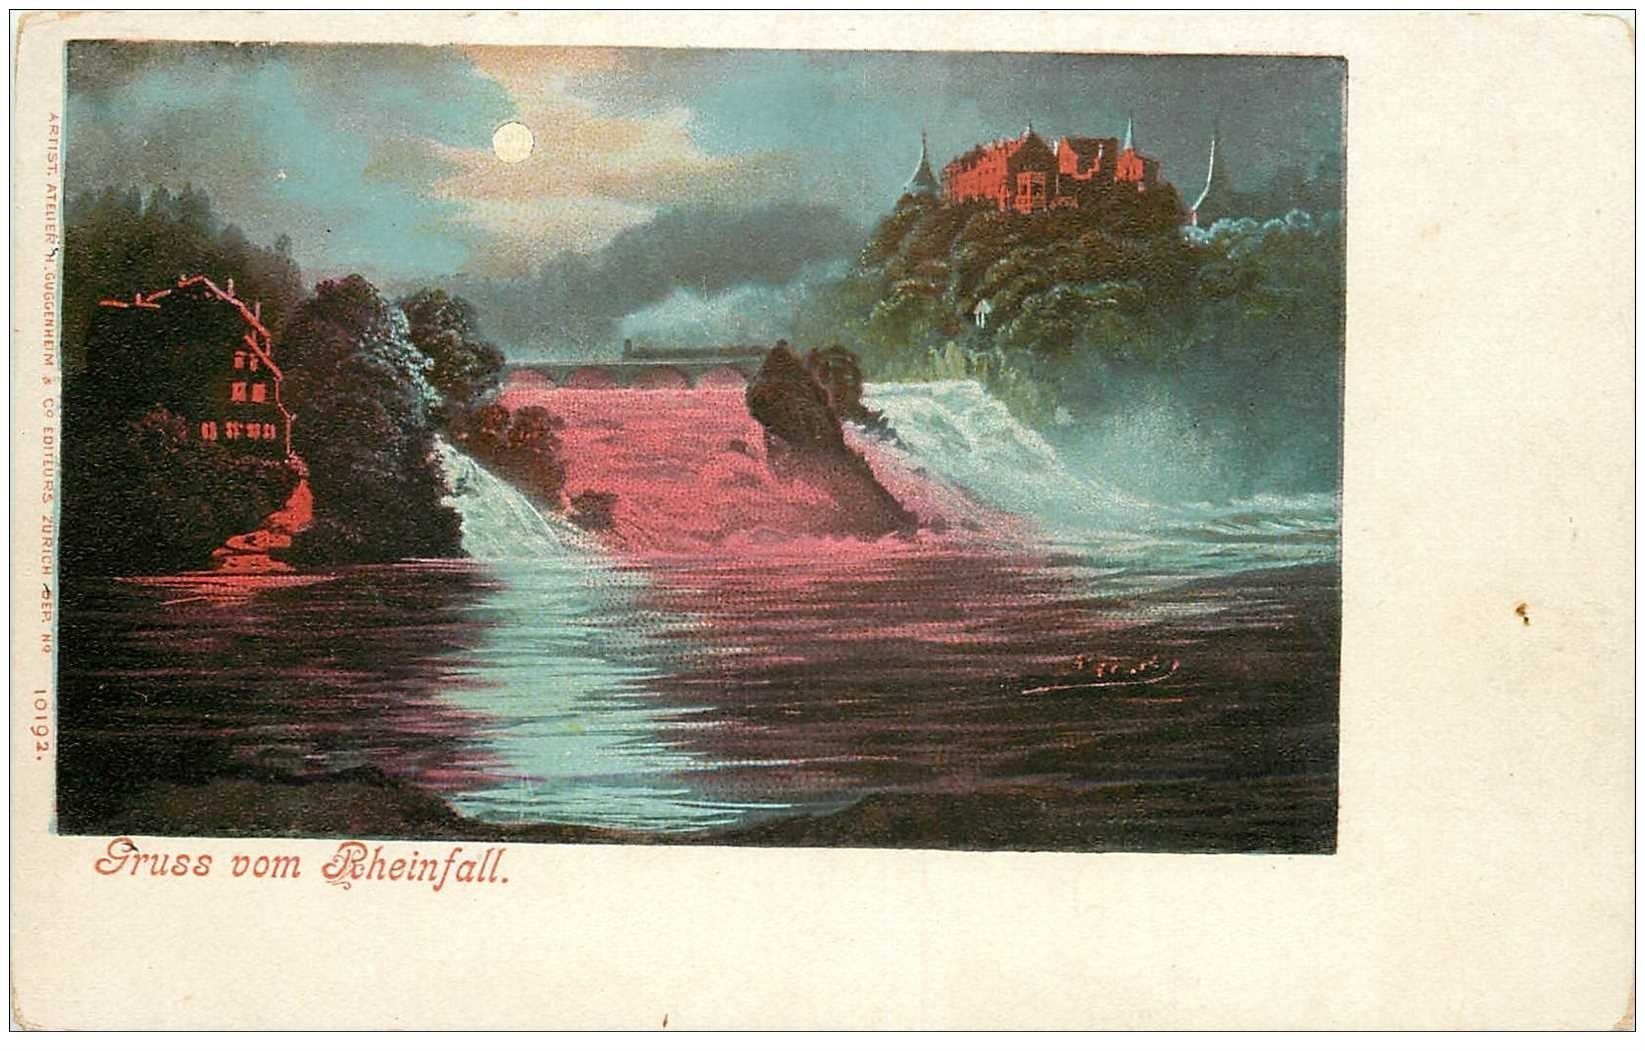 SUISSE. Gruss vom Rheinfall vers 1900